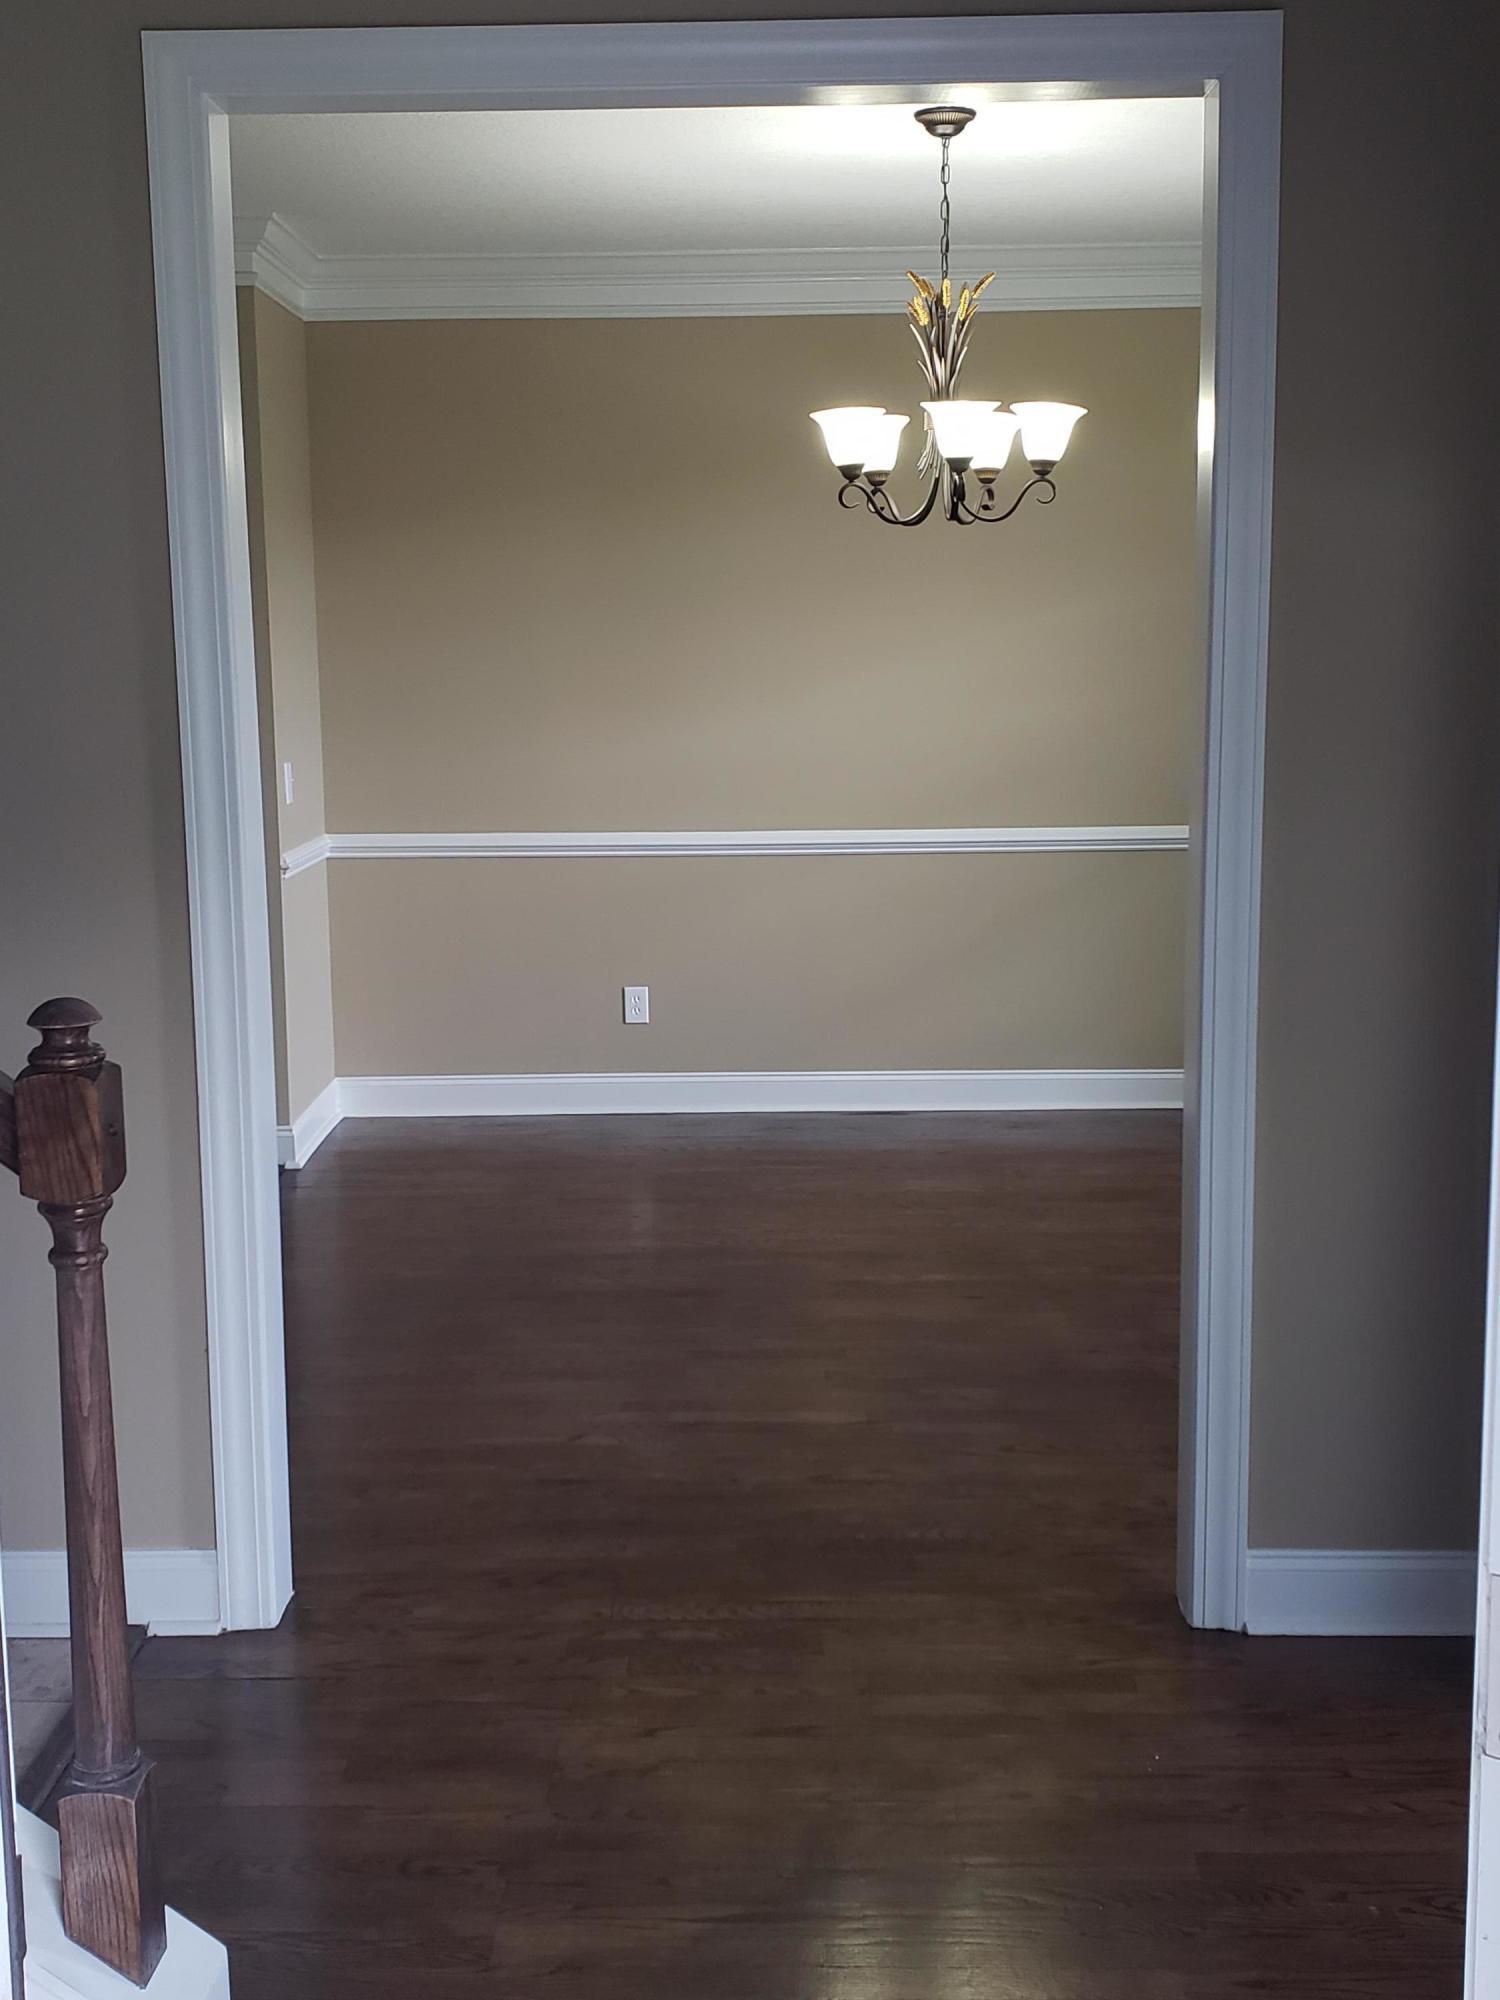 Montague Pointe Homes For Sale - 100 Gavins, Goose Creek, SC - 14